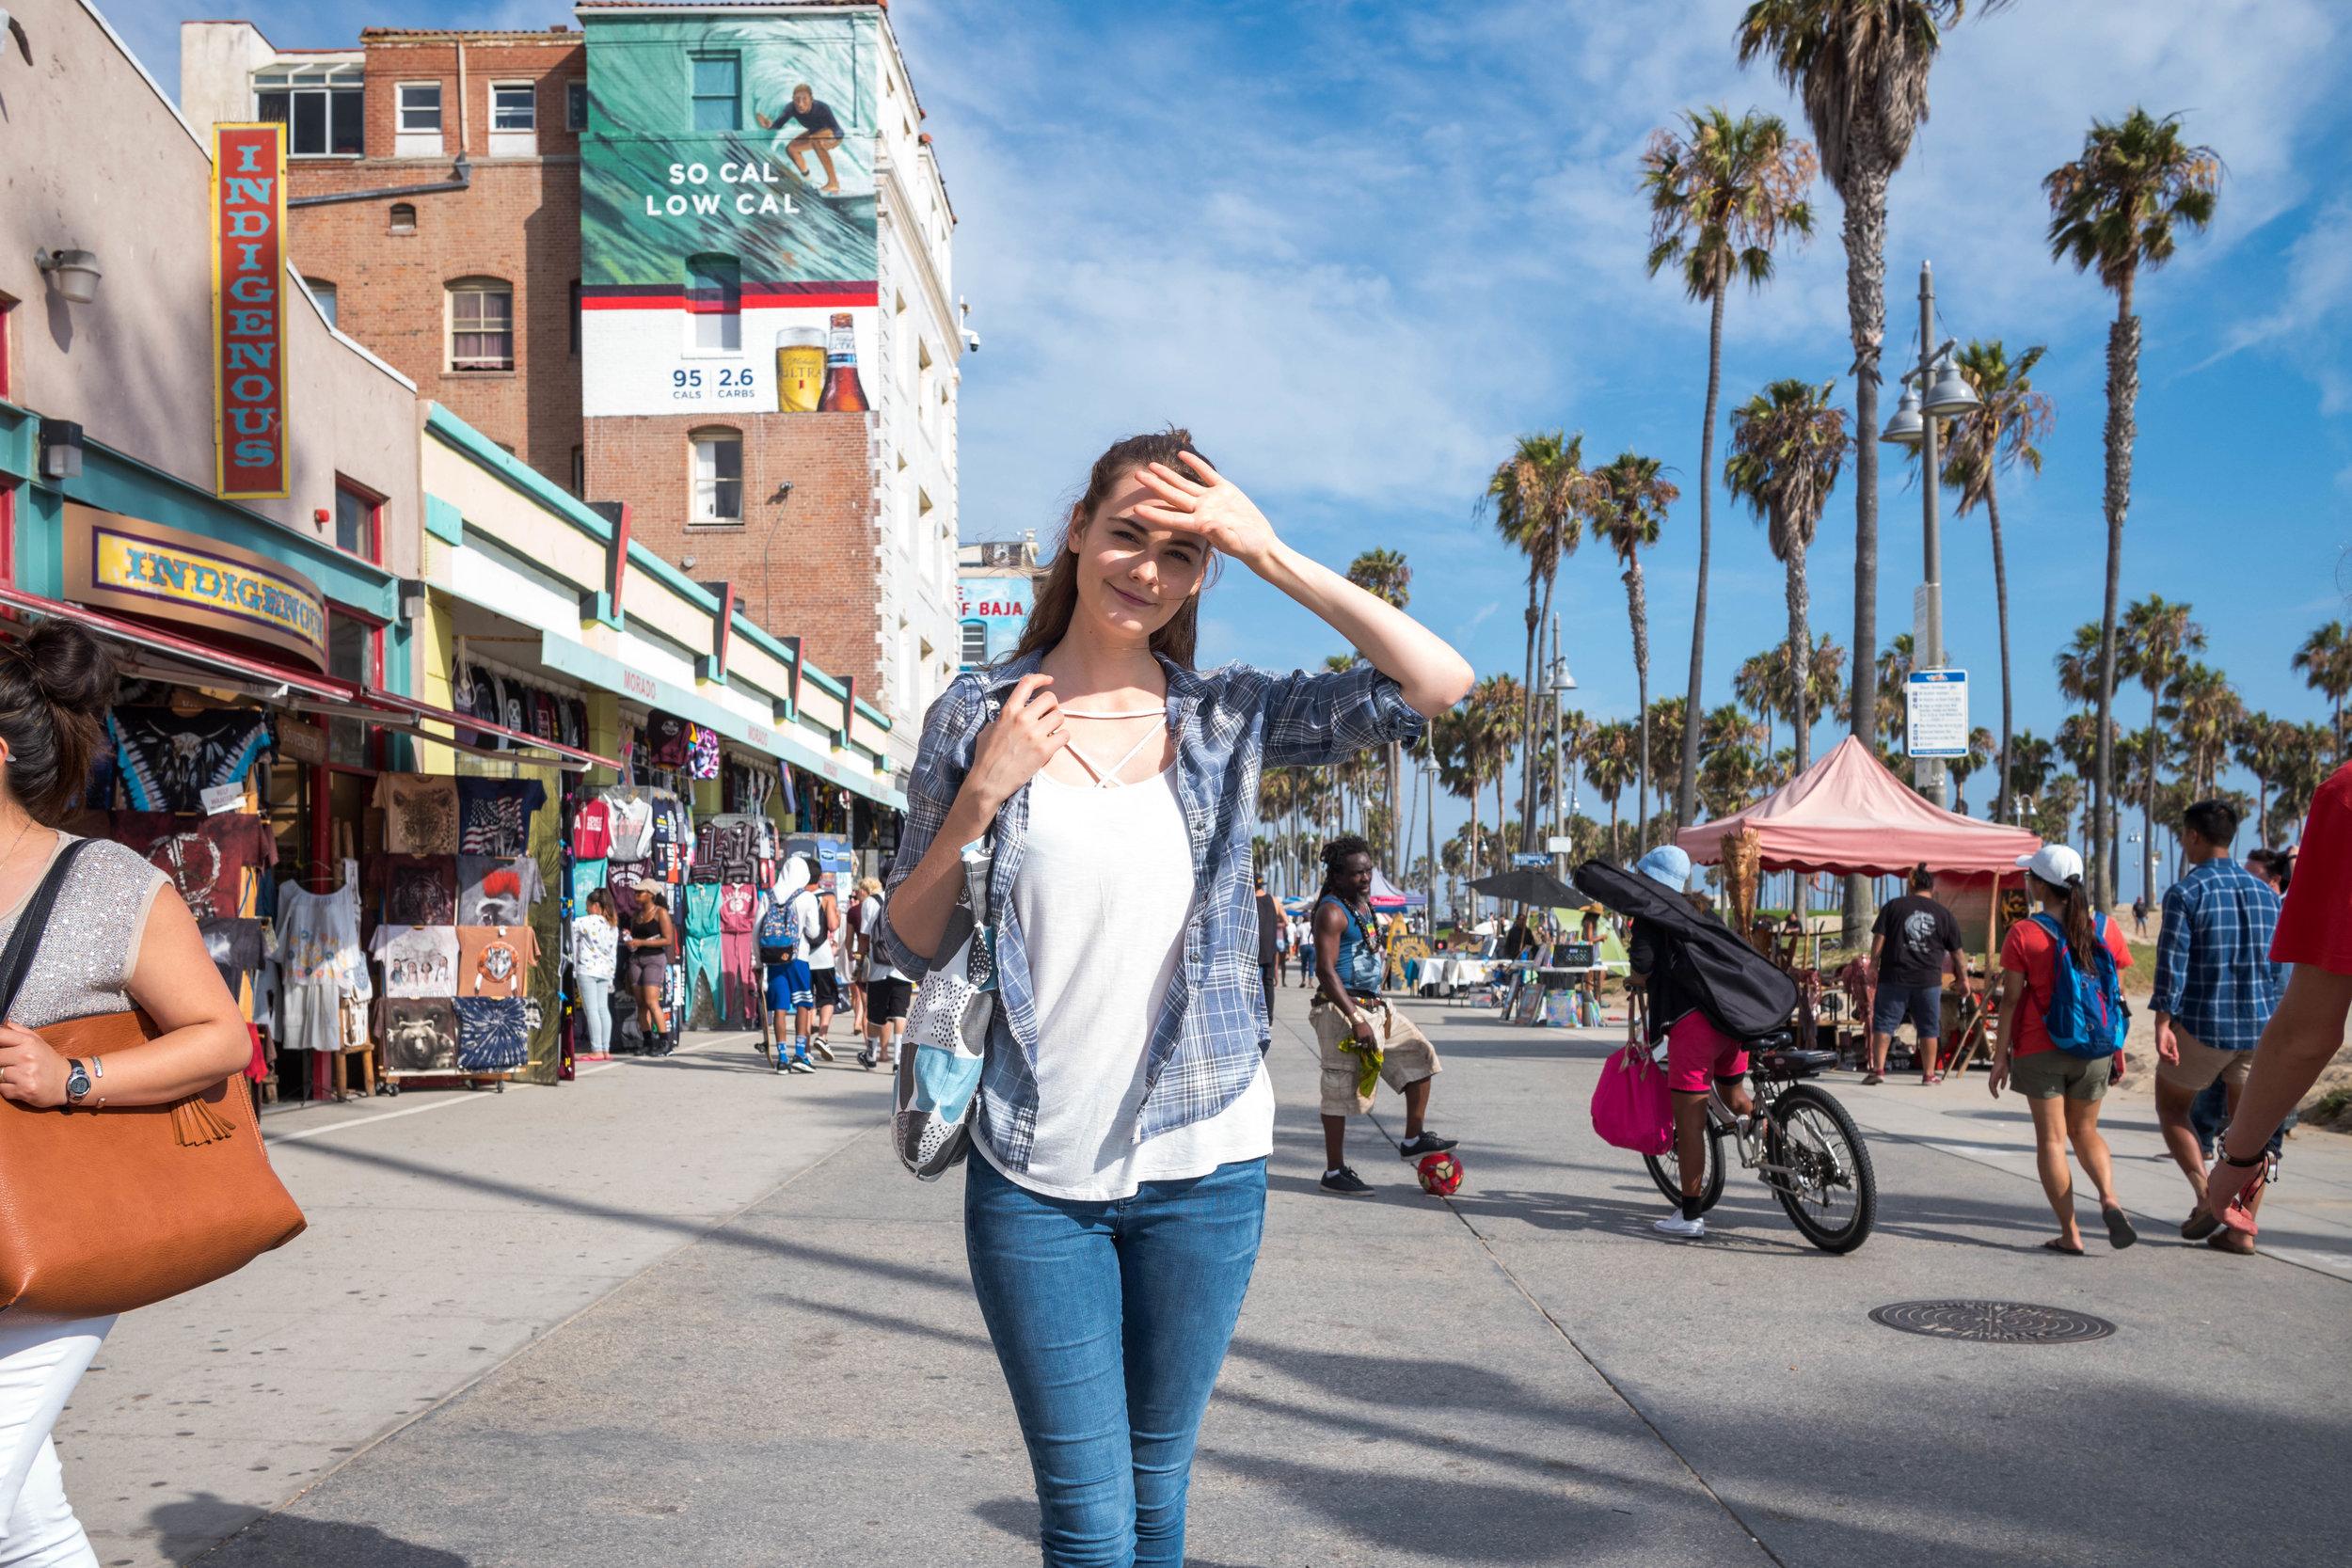 At the Venice Beach Promenade. Leica 28mm f/1.4 Summilux ASPH